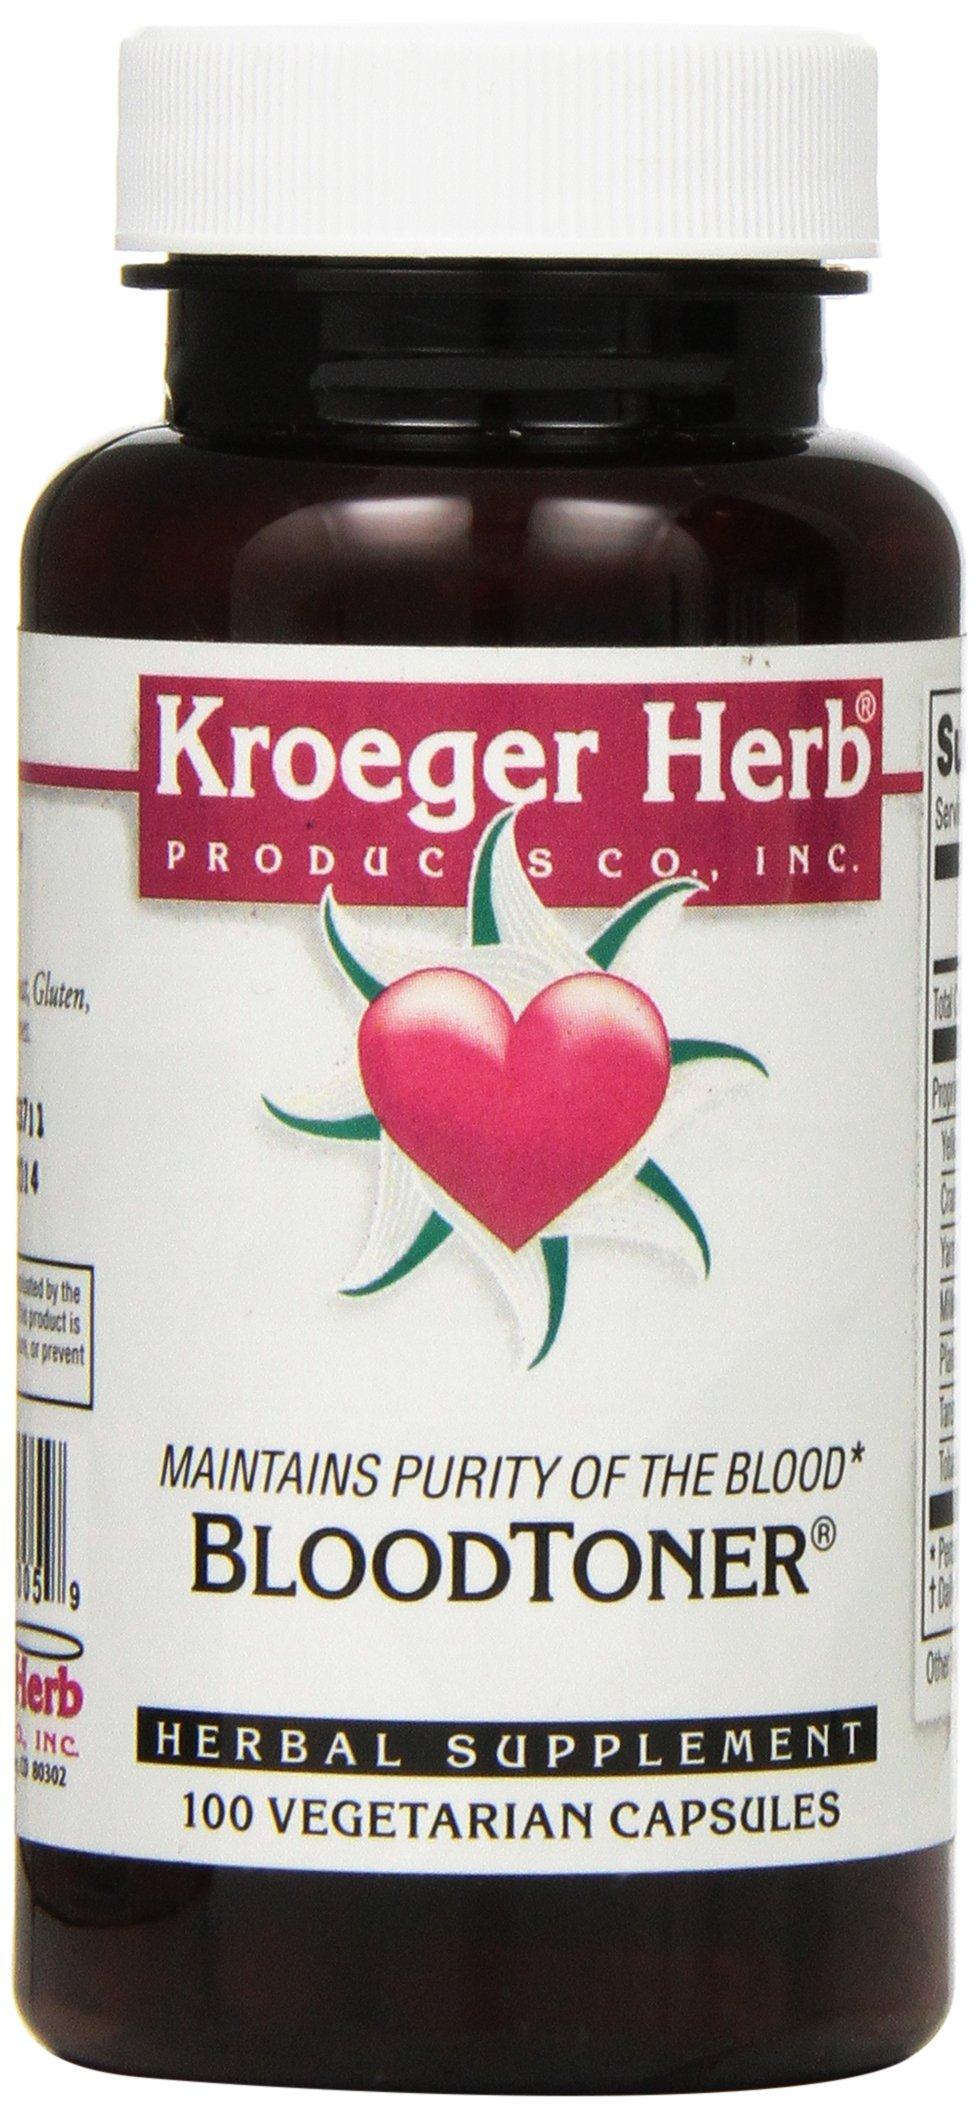 Kroeger Herb Capsules, Blood Toner Vegetarian, 100 Count